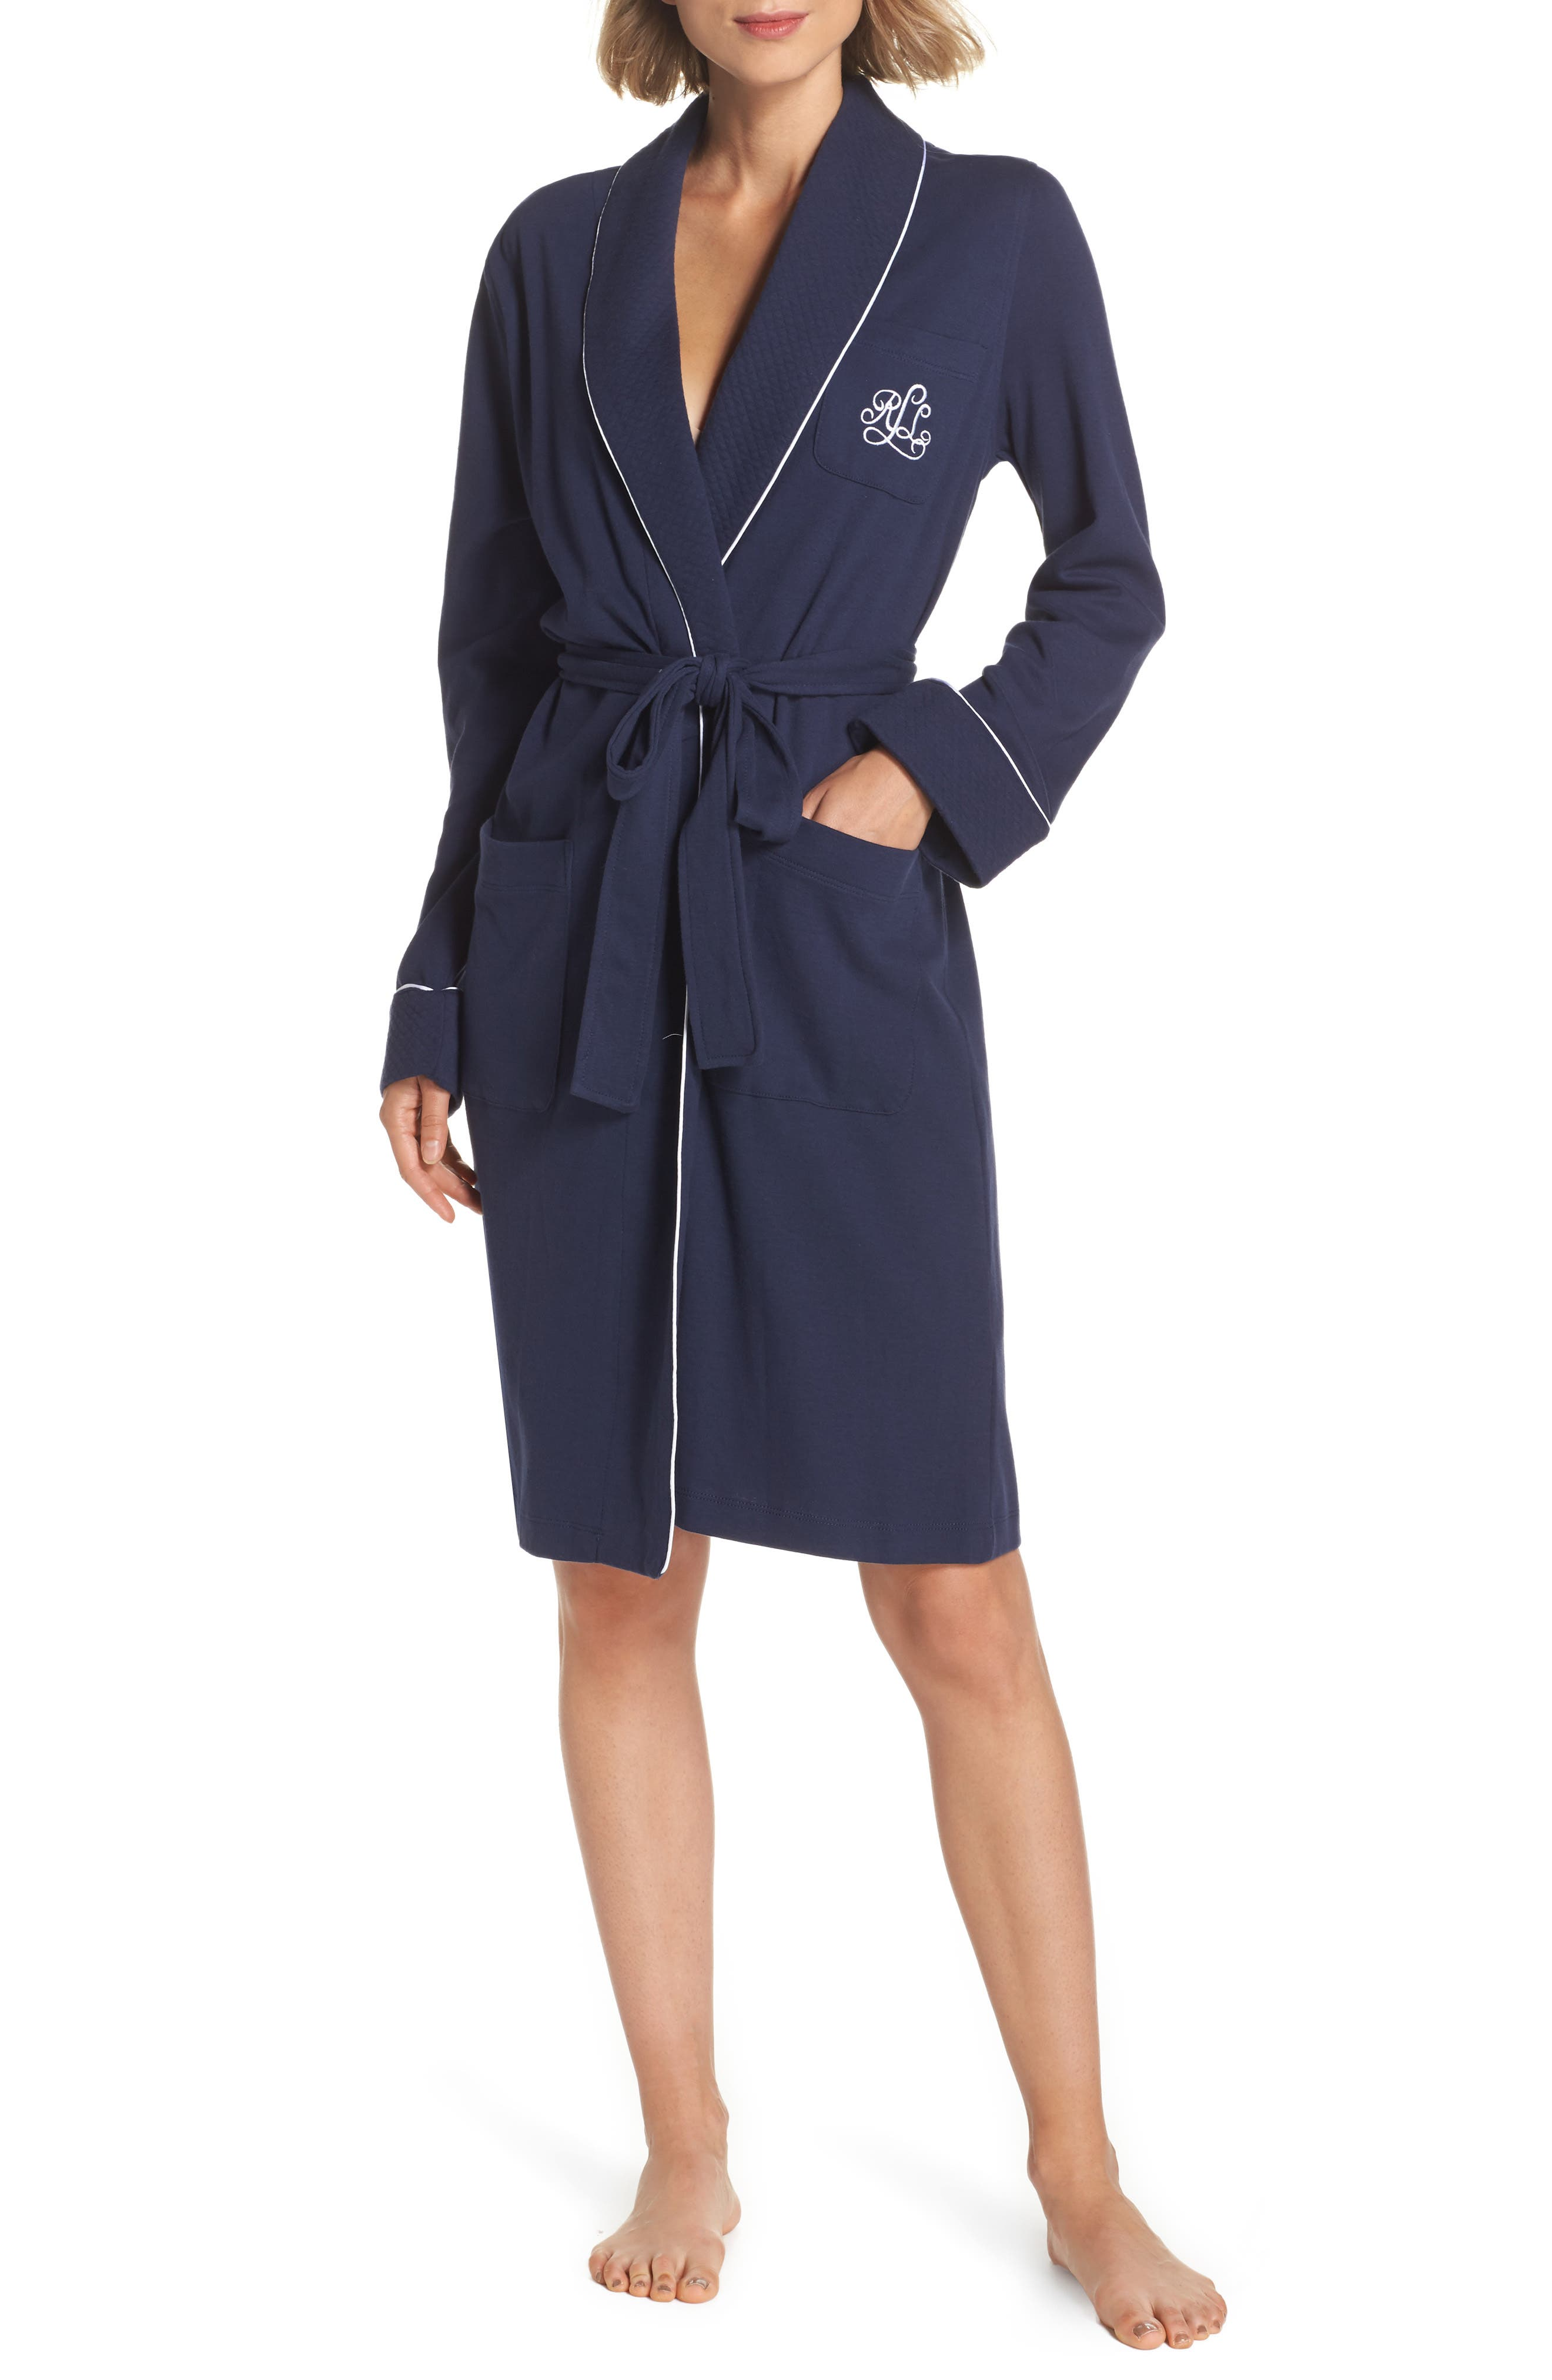 Polo Cowl Lauren Long Ralph Navy Neck Dress Sequence Chart 76Ygybfv